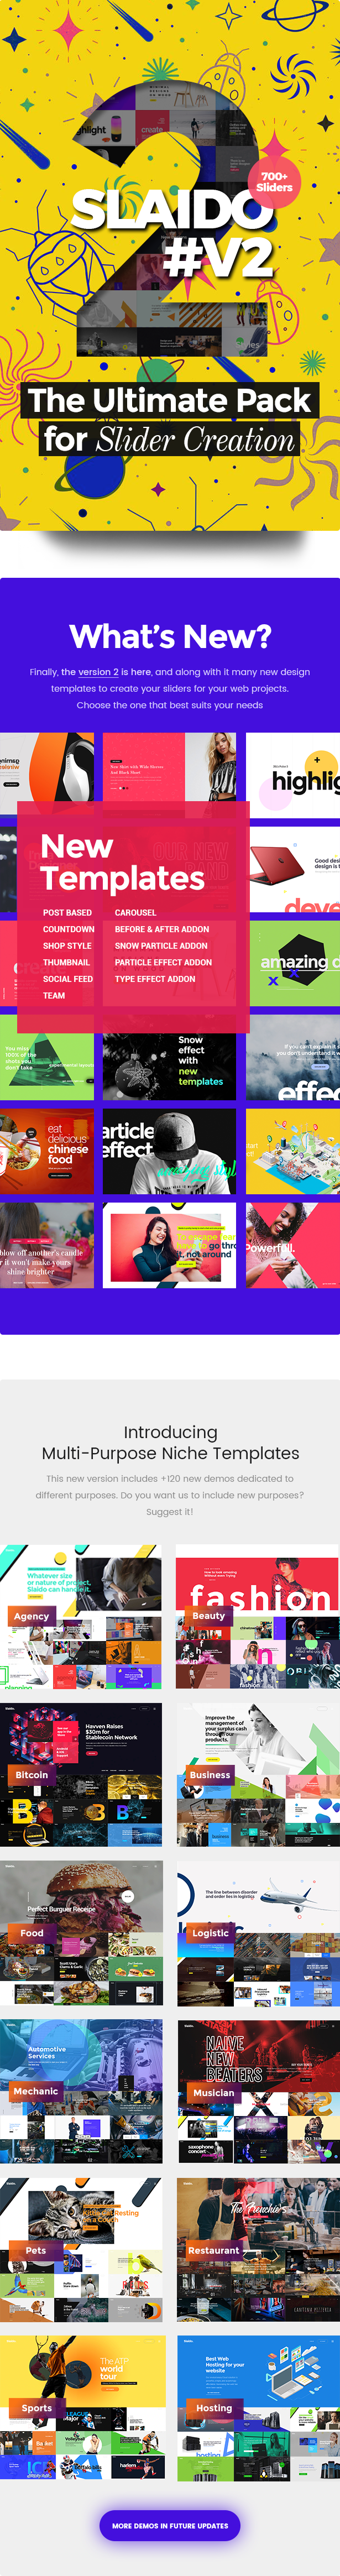 Slaido - Template Pack for Slider Revolution WordPress Plugin - 3